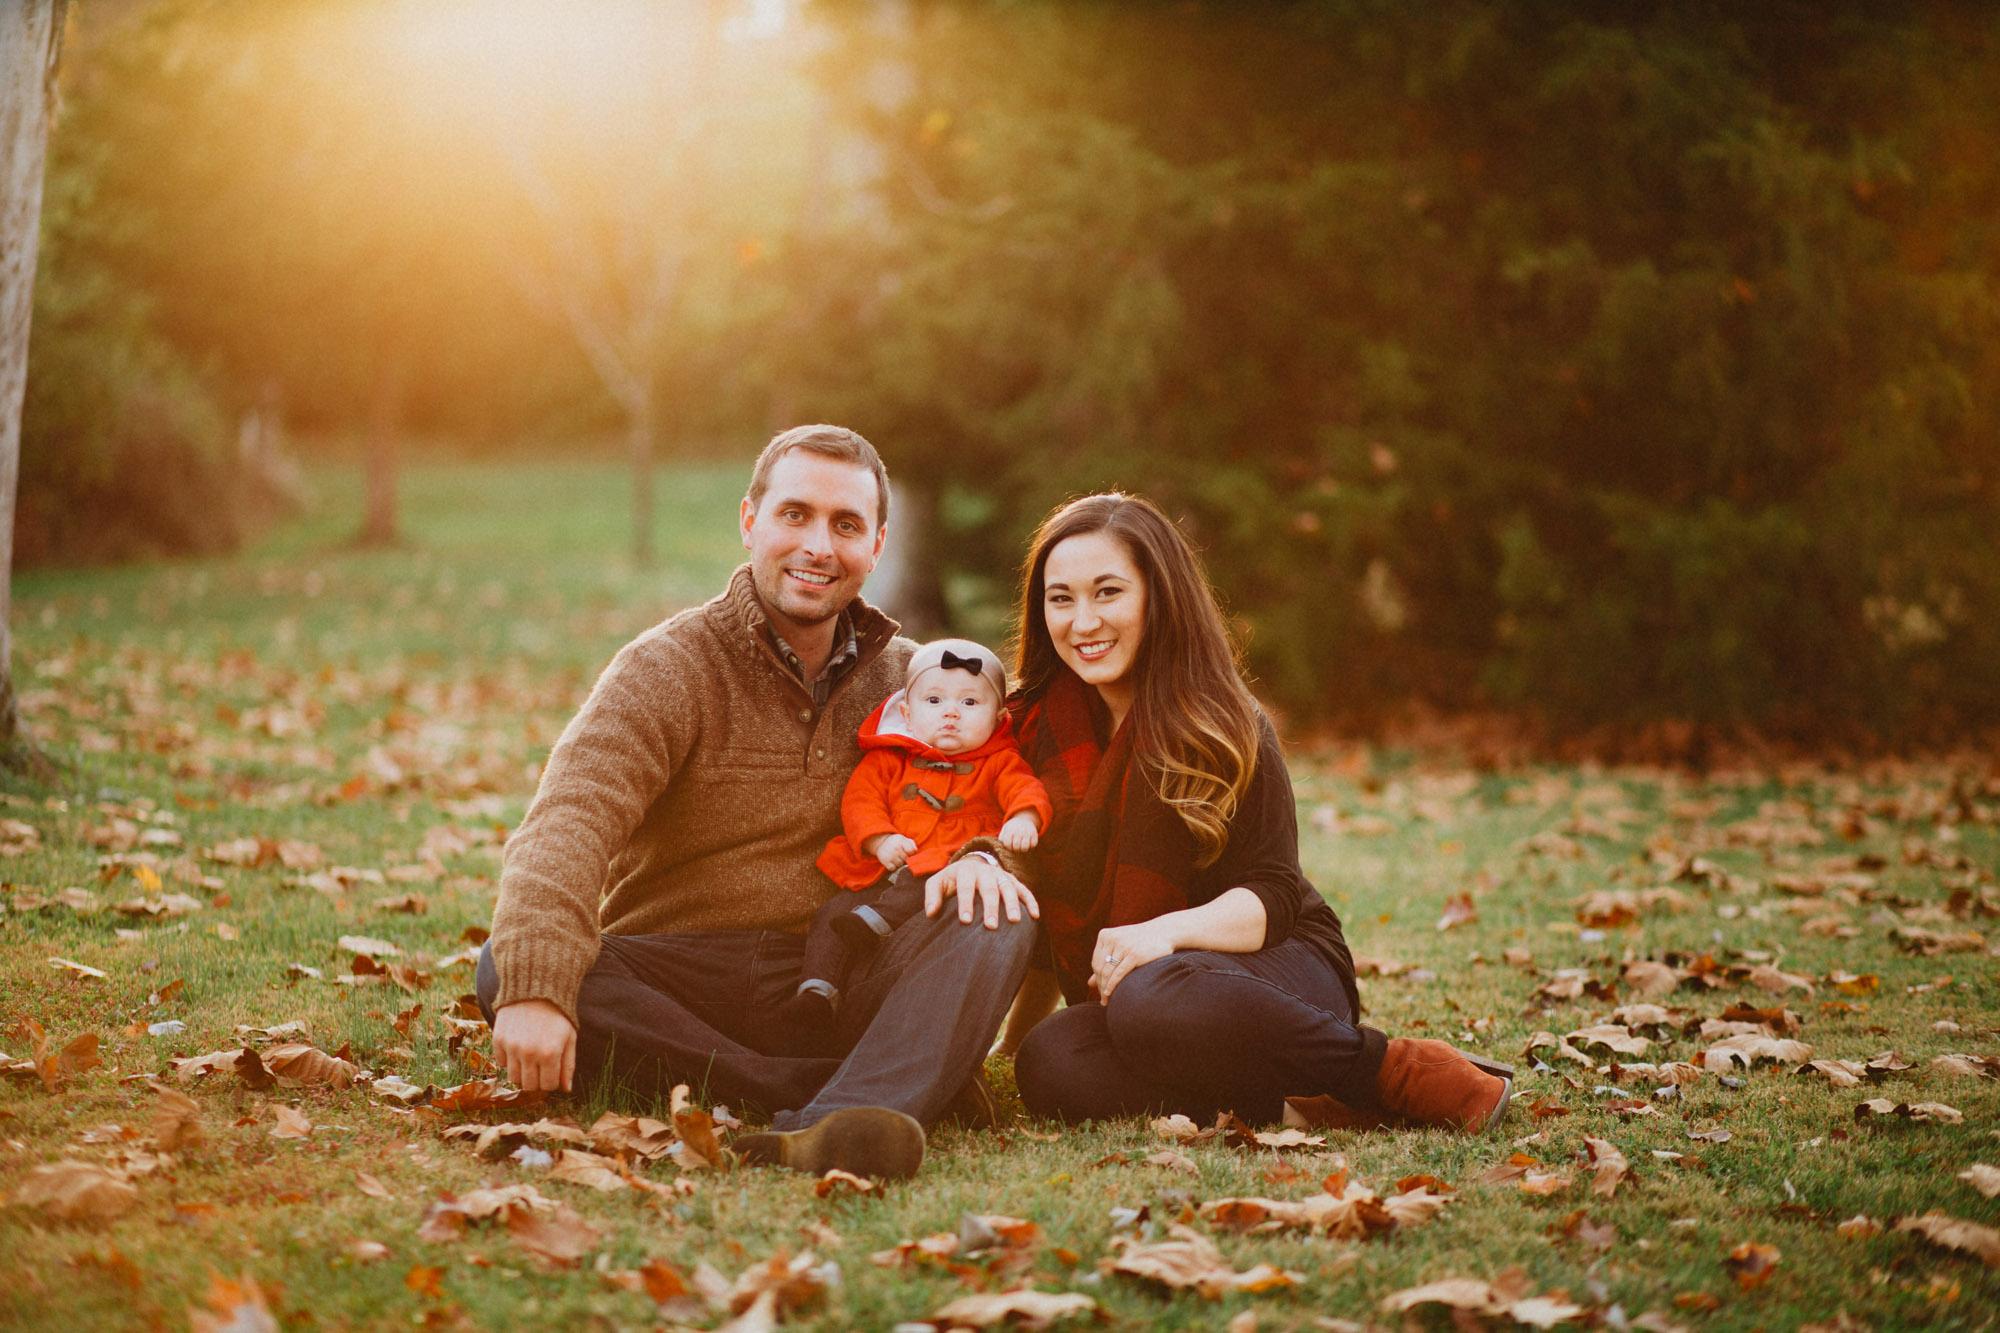 The Brauns - Dayton Family Photos - 08.jpg